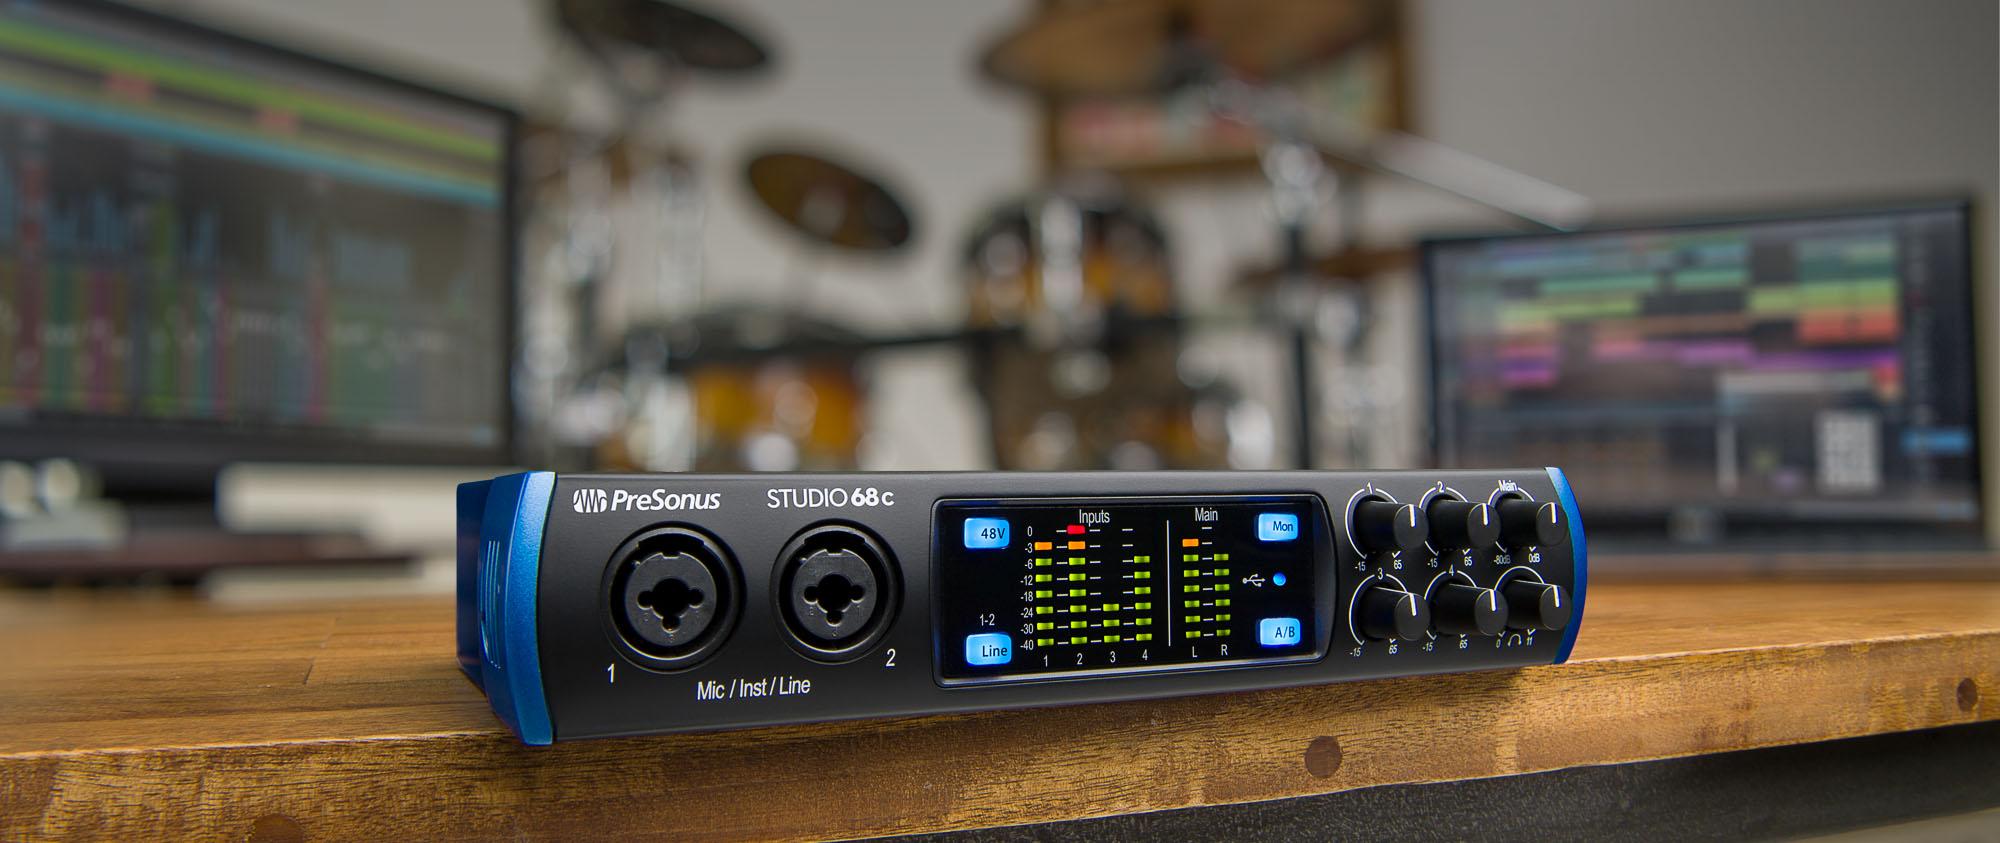 Studio 68c | PreSonus